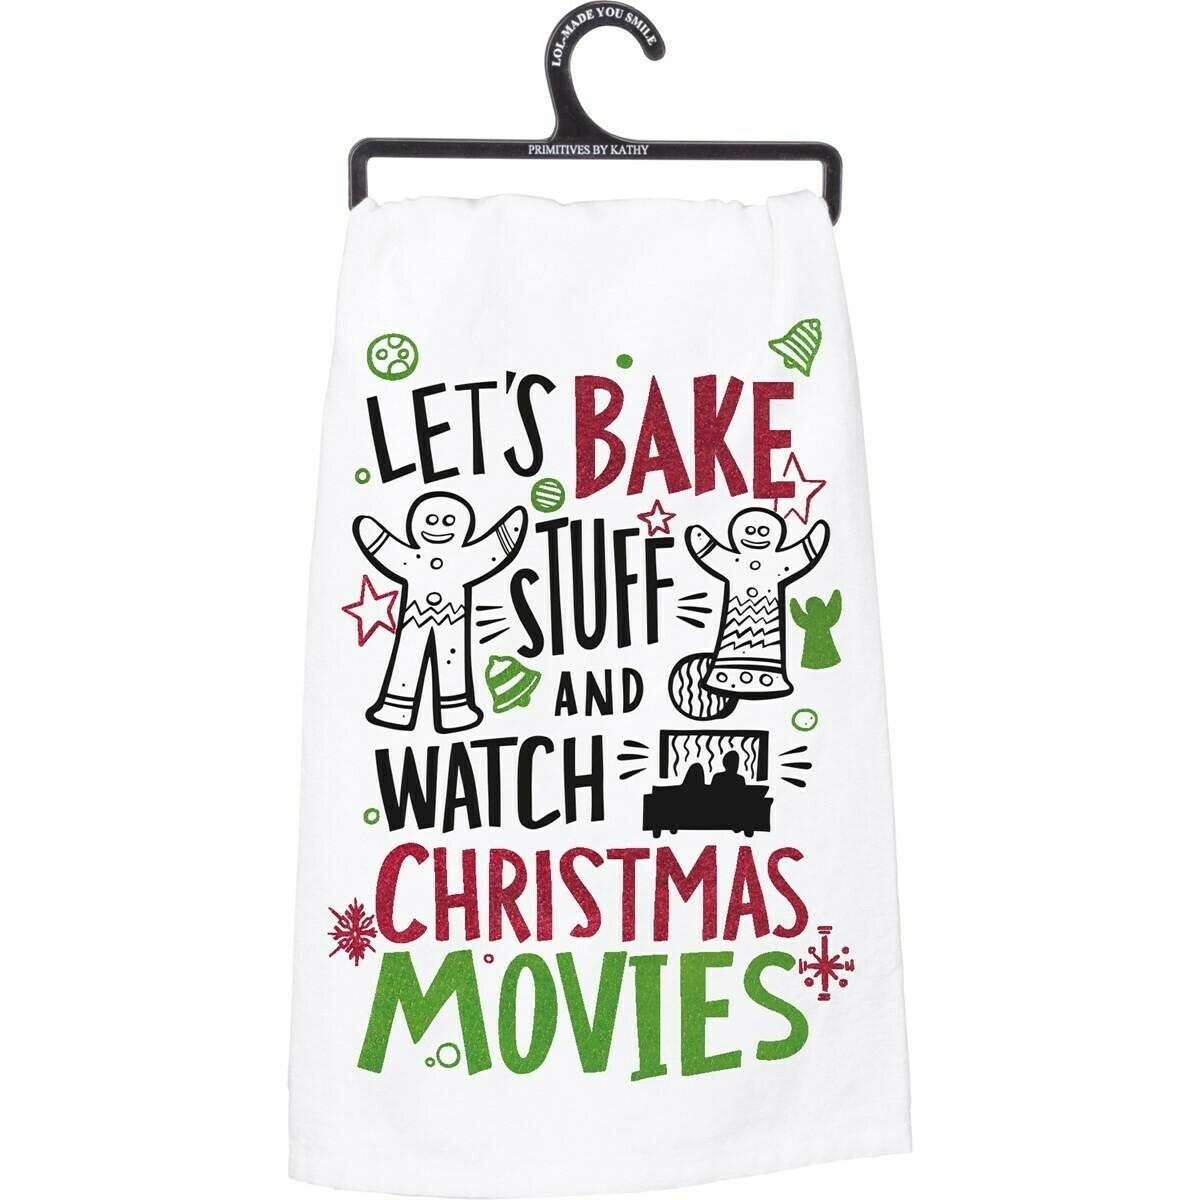 Bake & Movies Glitter Dish Towel